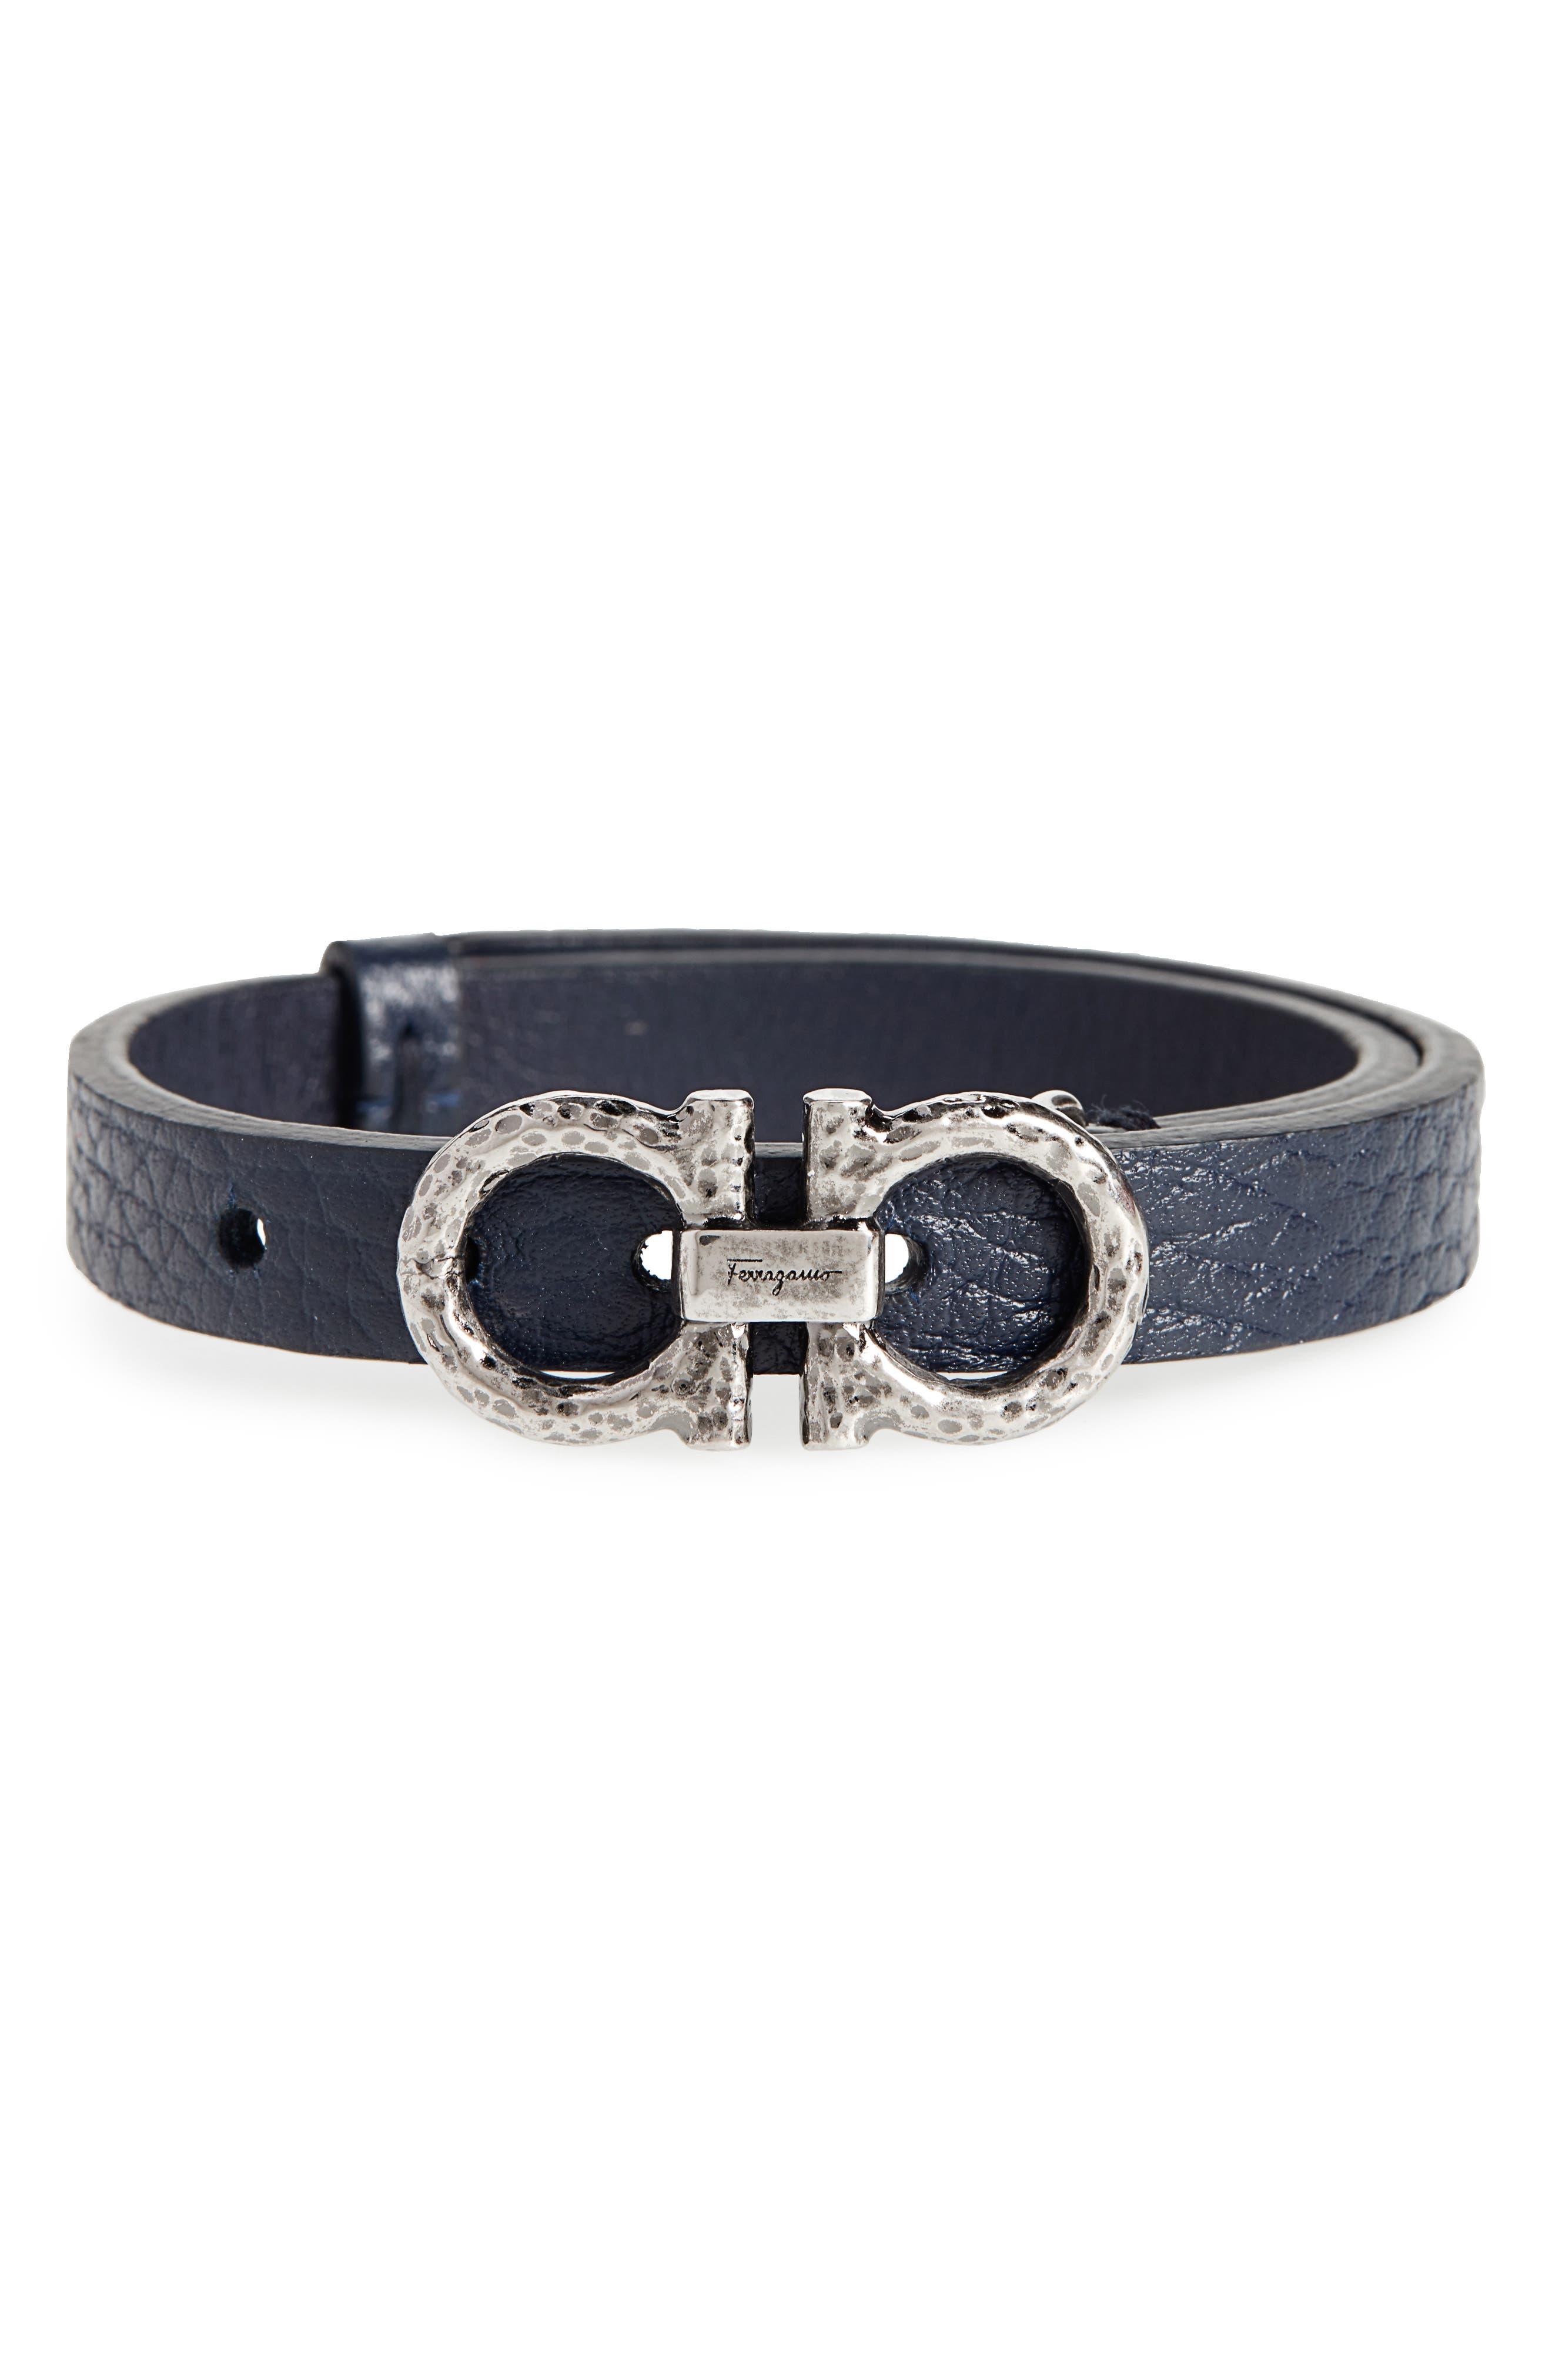 SALVATORE FERRAGAMO,                             Double Gancio Leather Bracelet,                             Main thumbnail 1, color,                             BLUE MARINE/ SILVER